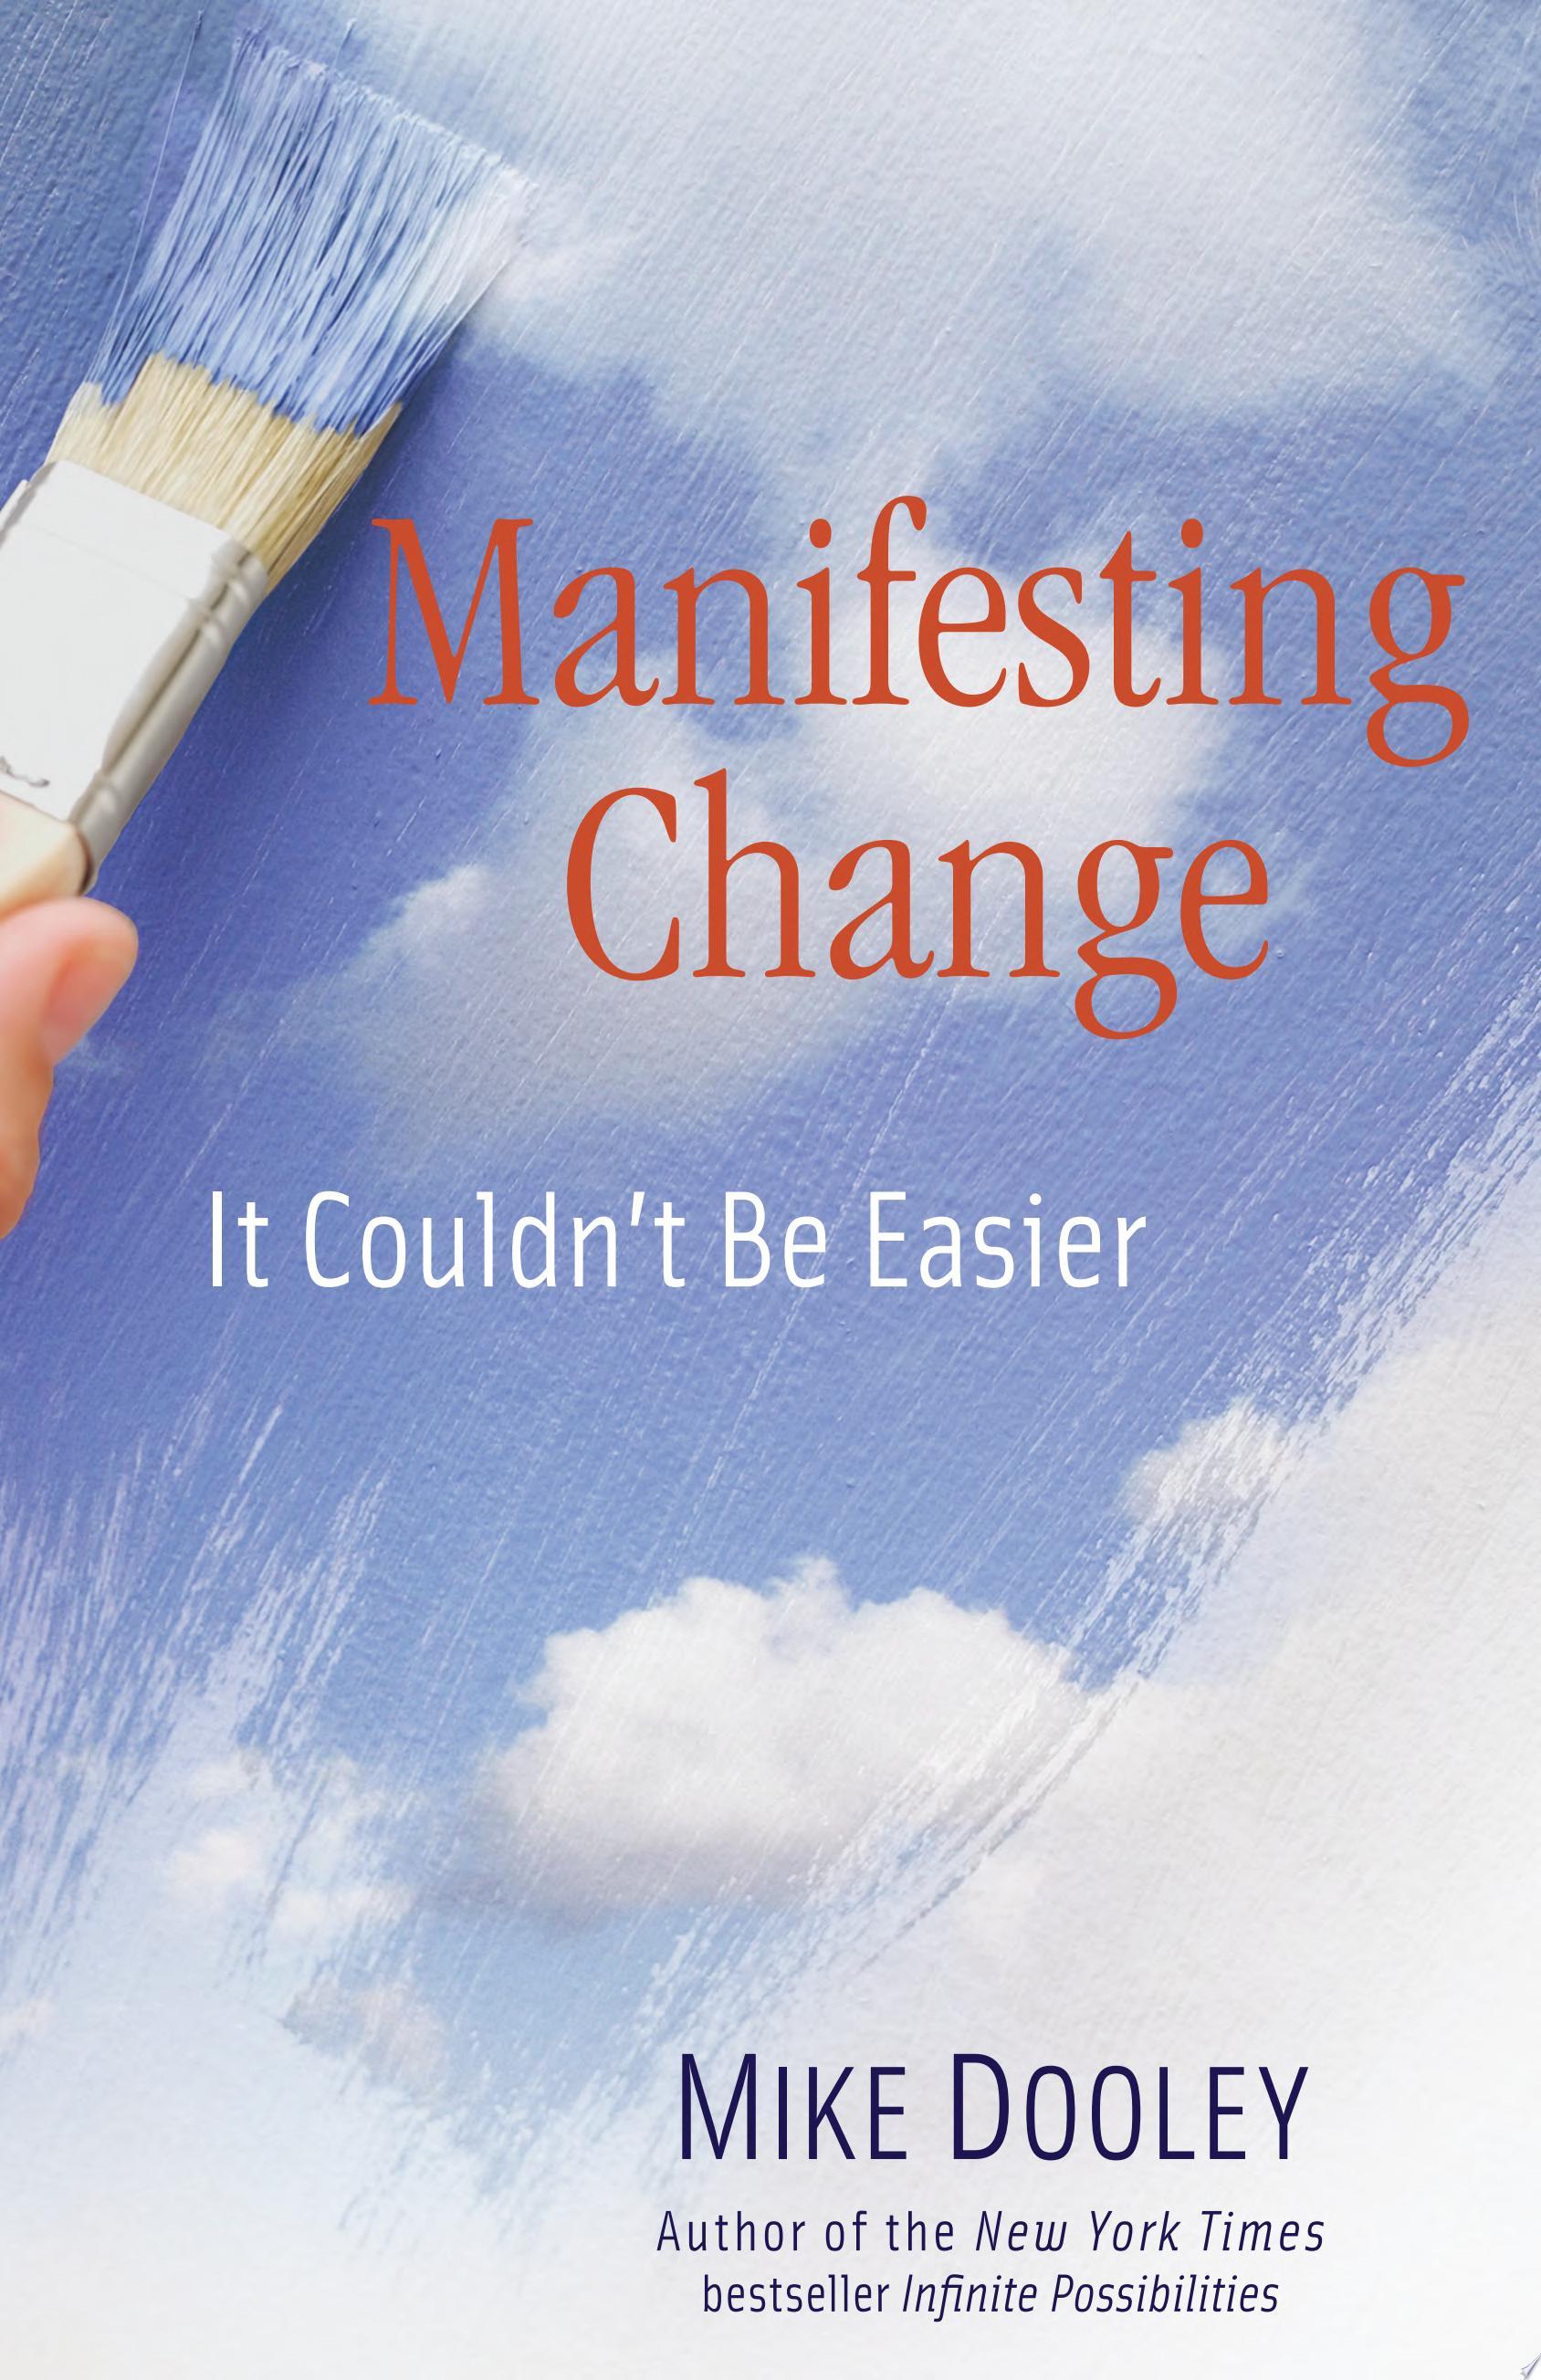 Manifesting Change